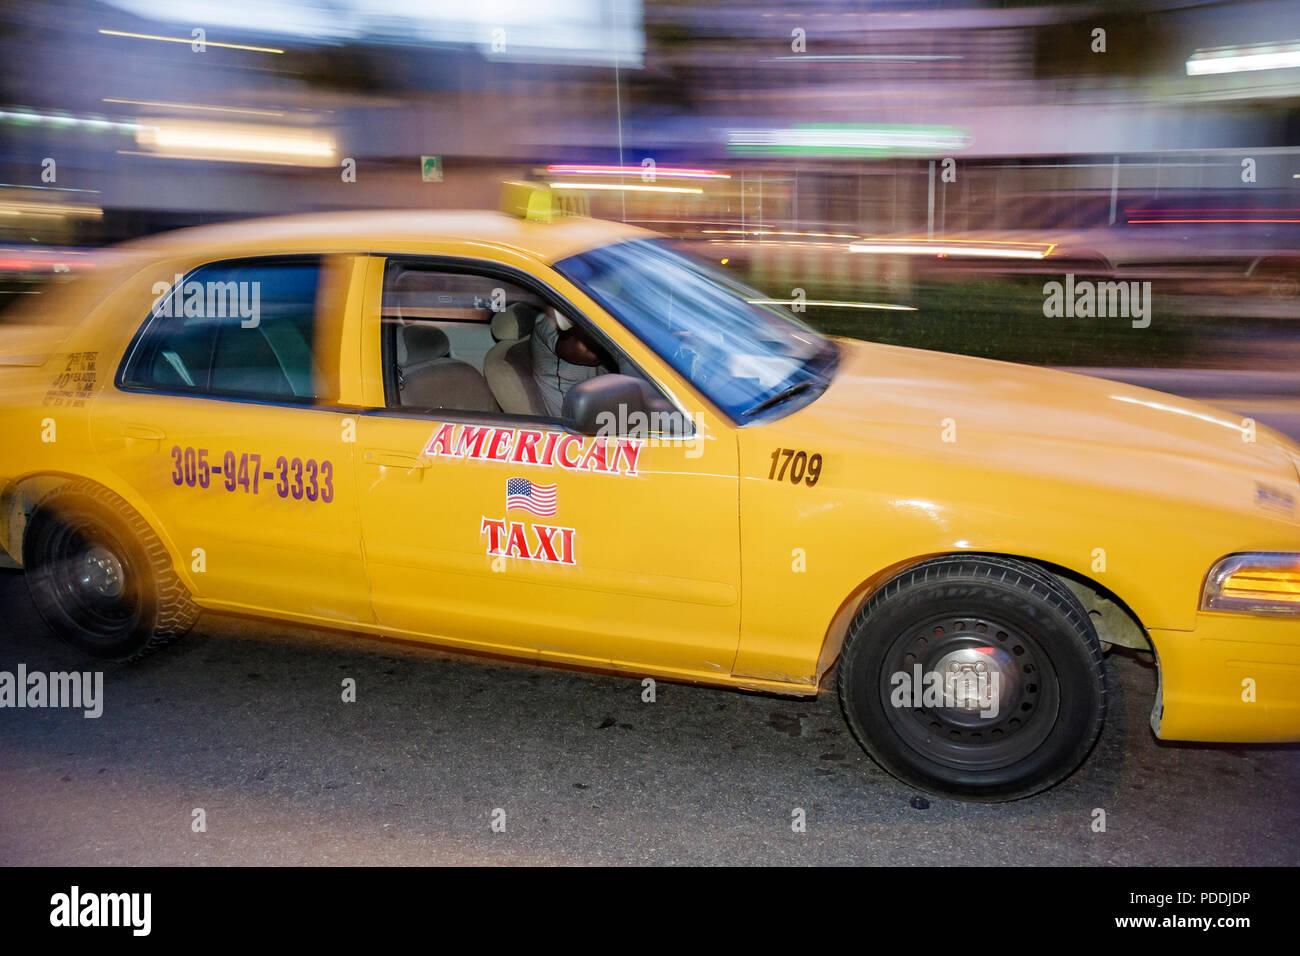 Miami Beach Florida Washington Avenue yellow taxicab taxi cab automobile moving fare ride public transportation driver busines - Stock Image